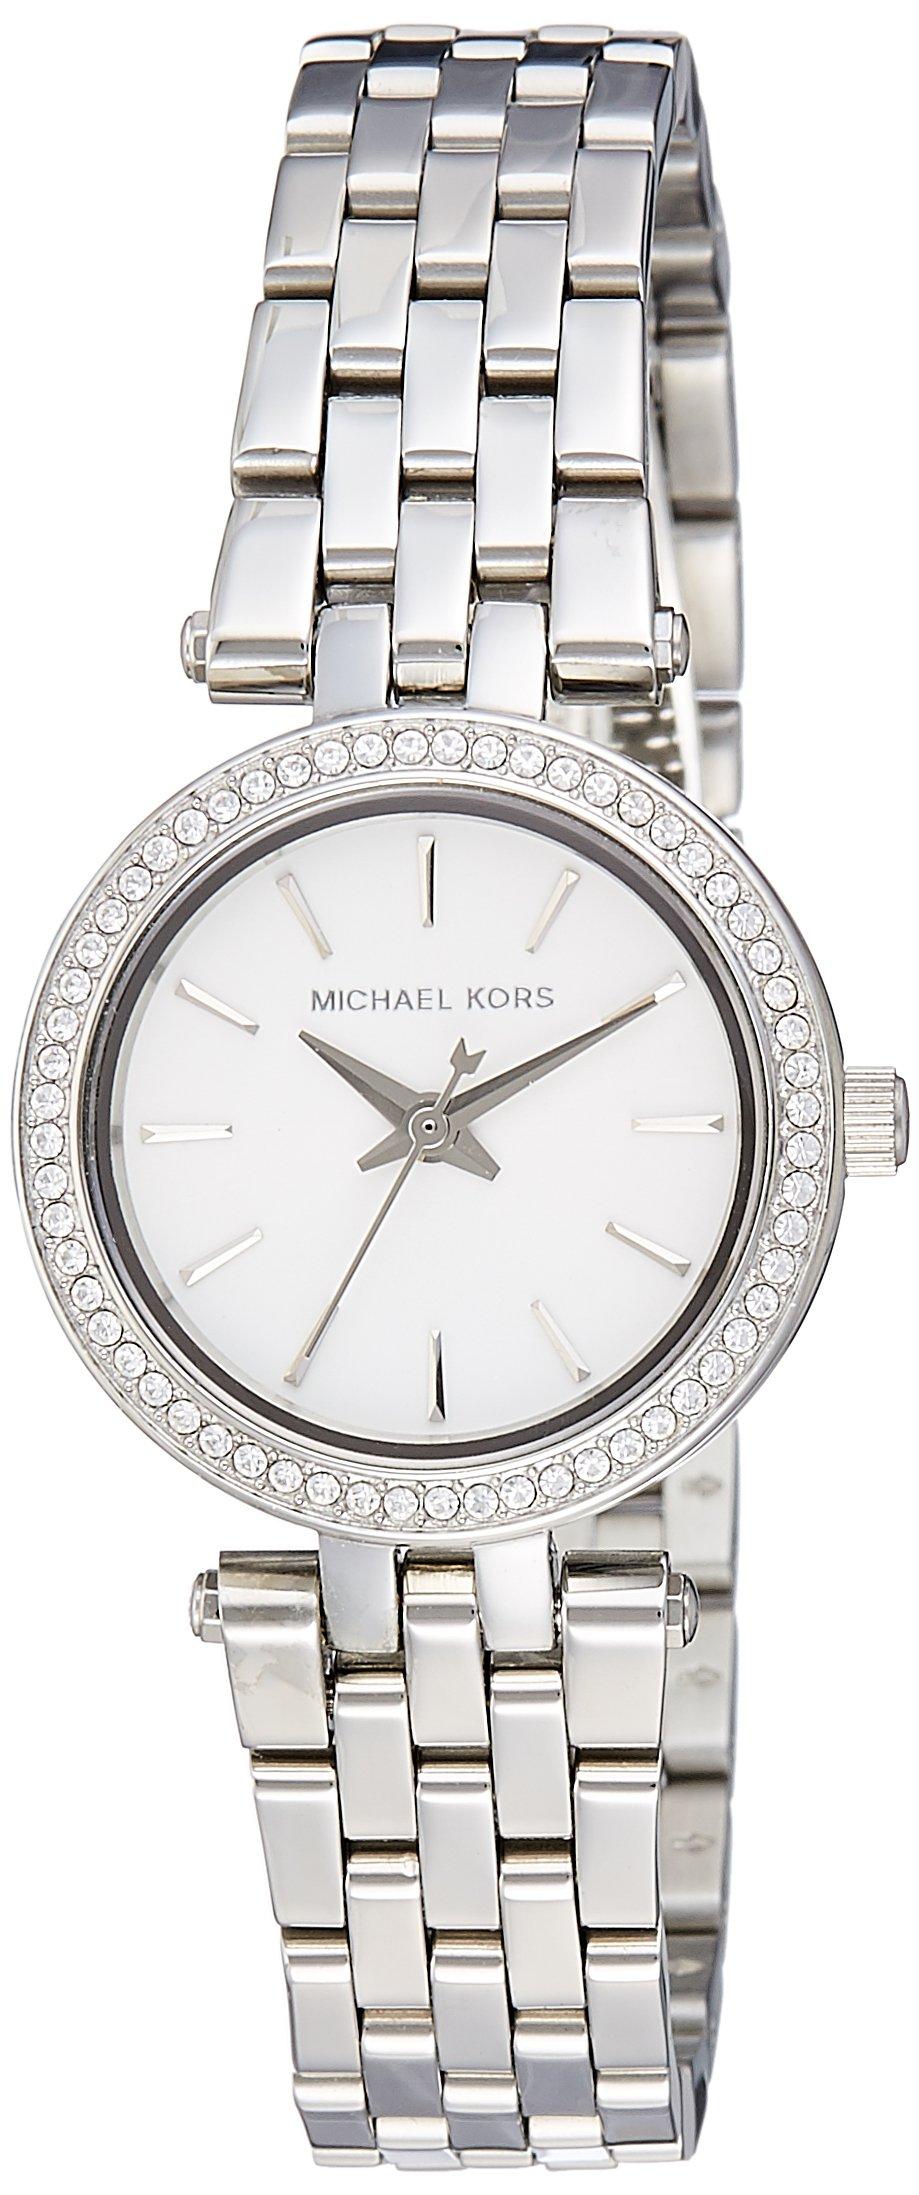 Michael Kors Women's Darci Silver-Tone Watch MK3294